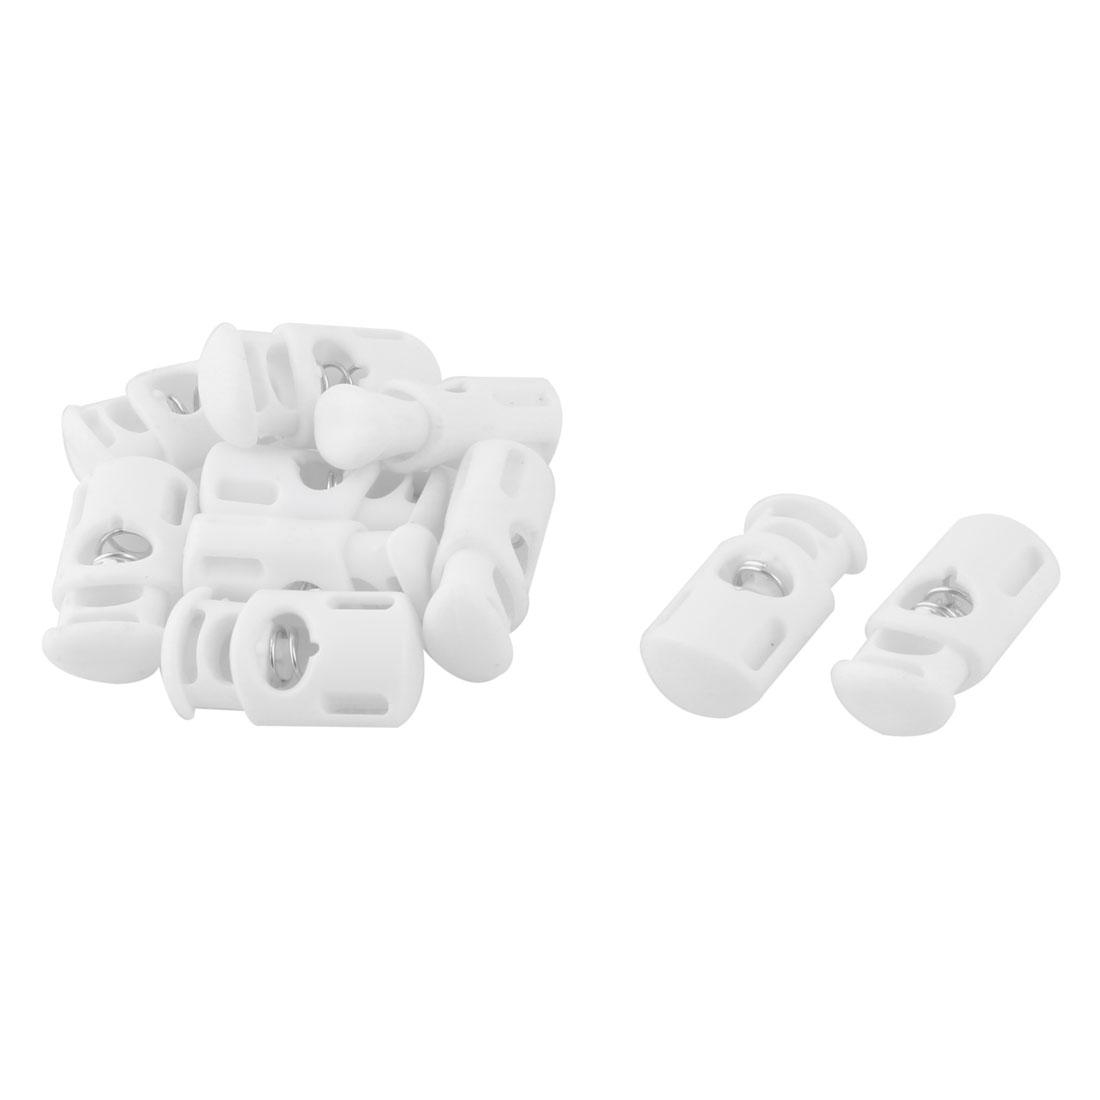 Plastic Single Hole Spring Loaded Clothes Sliding Cord Lock Fastener White 10pcs